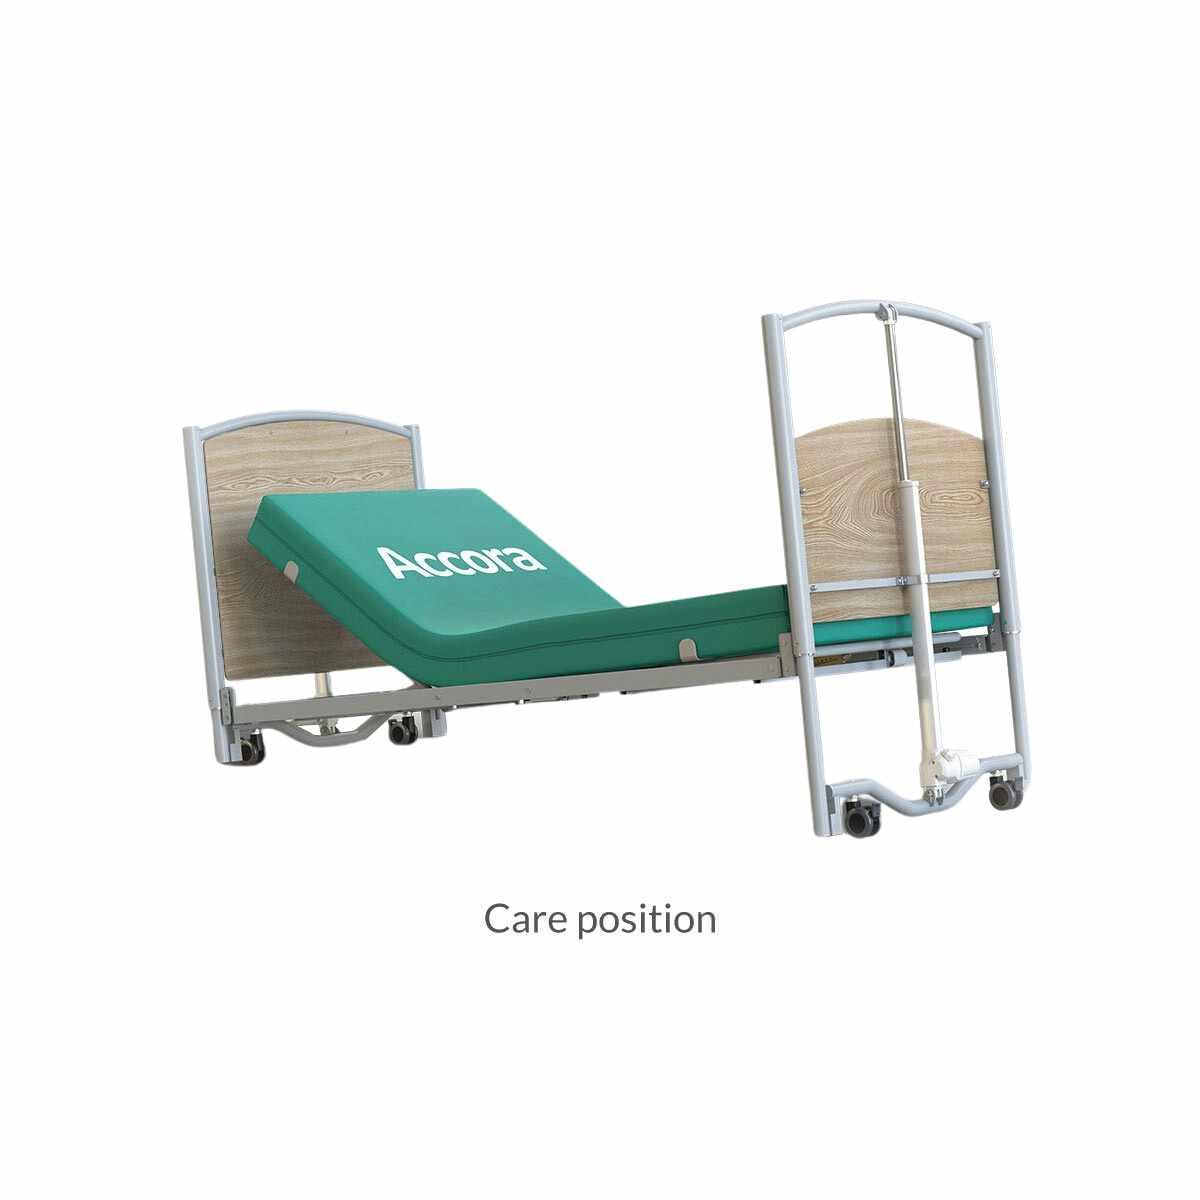 Accora Floor Bed 1 plus - care position